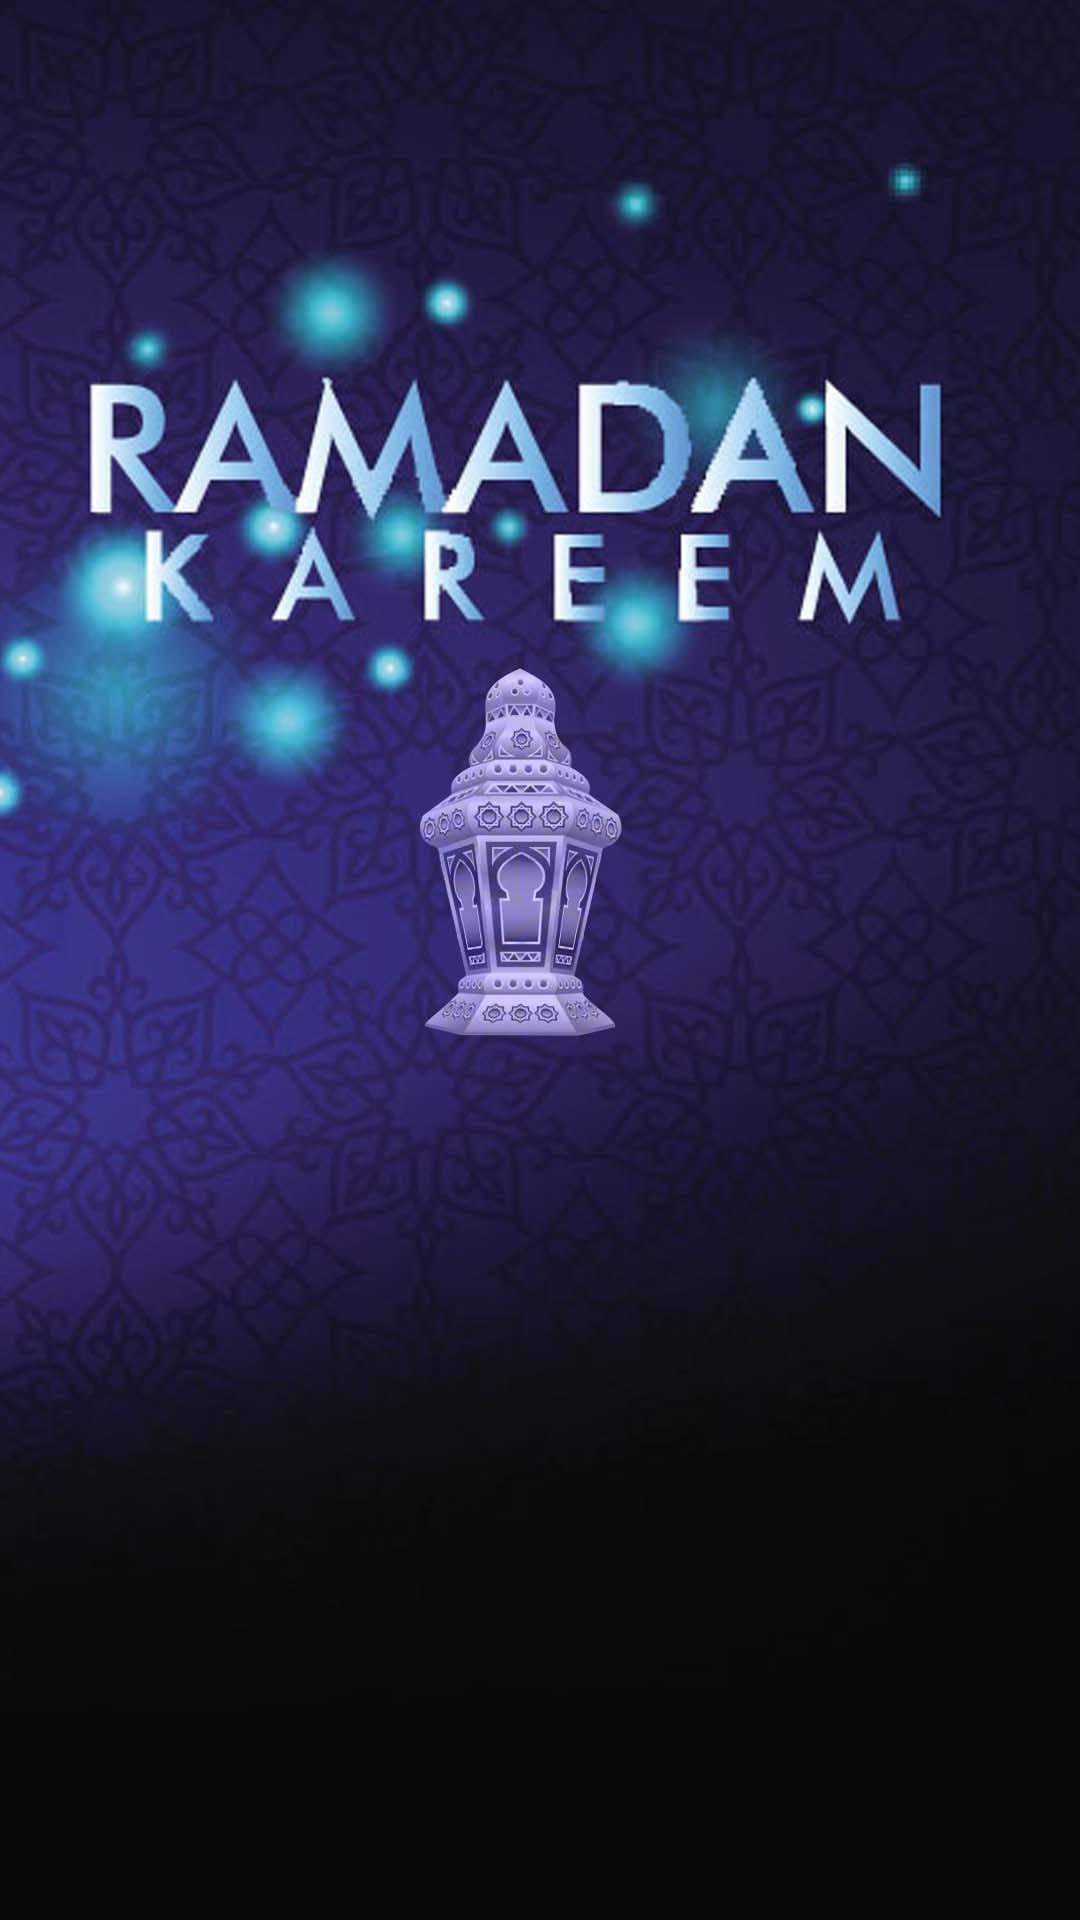 خلفيات موبايل رمضان كريم Mobile Wallpapers HD 4 خلفيات موبايل رمضان كريم Mobile Wallpapers HD